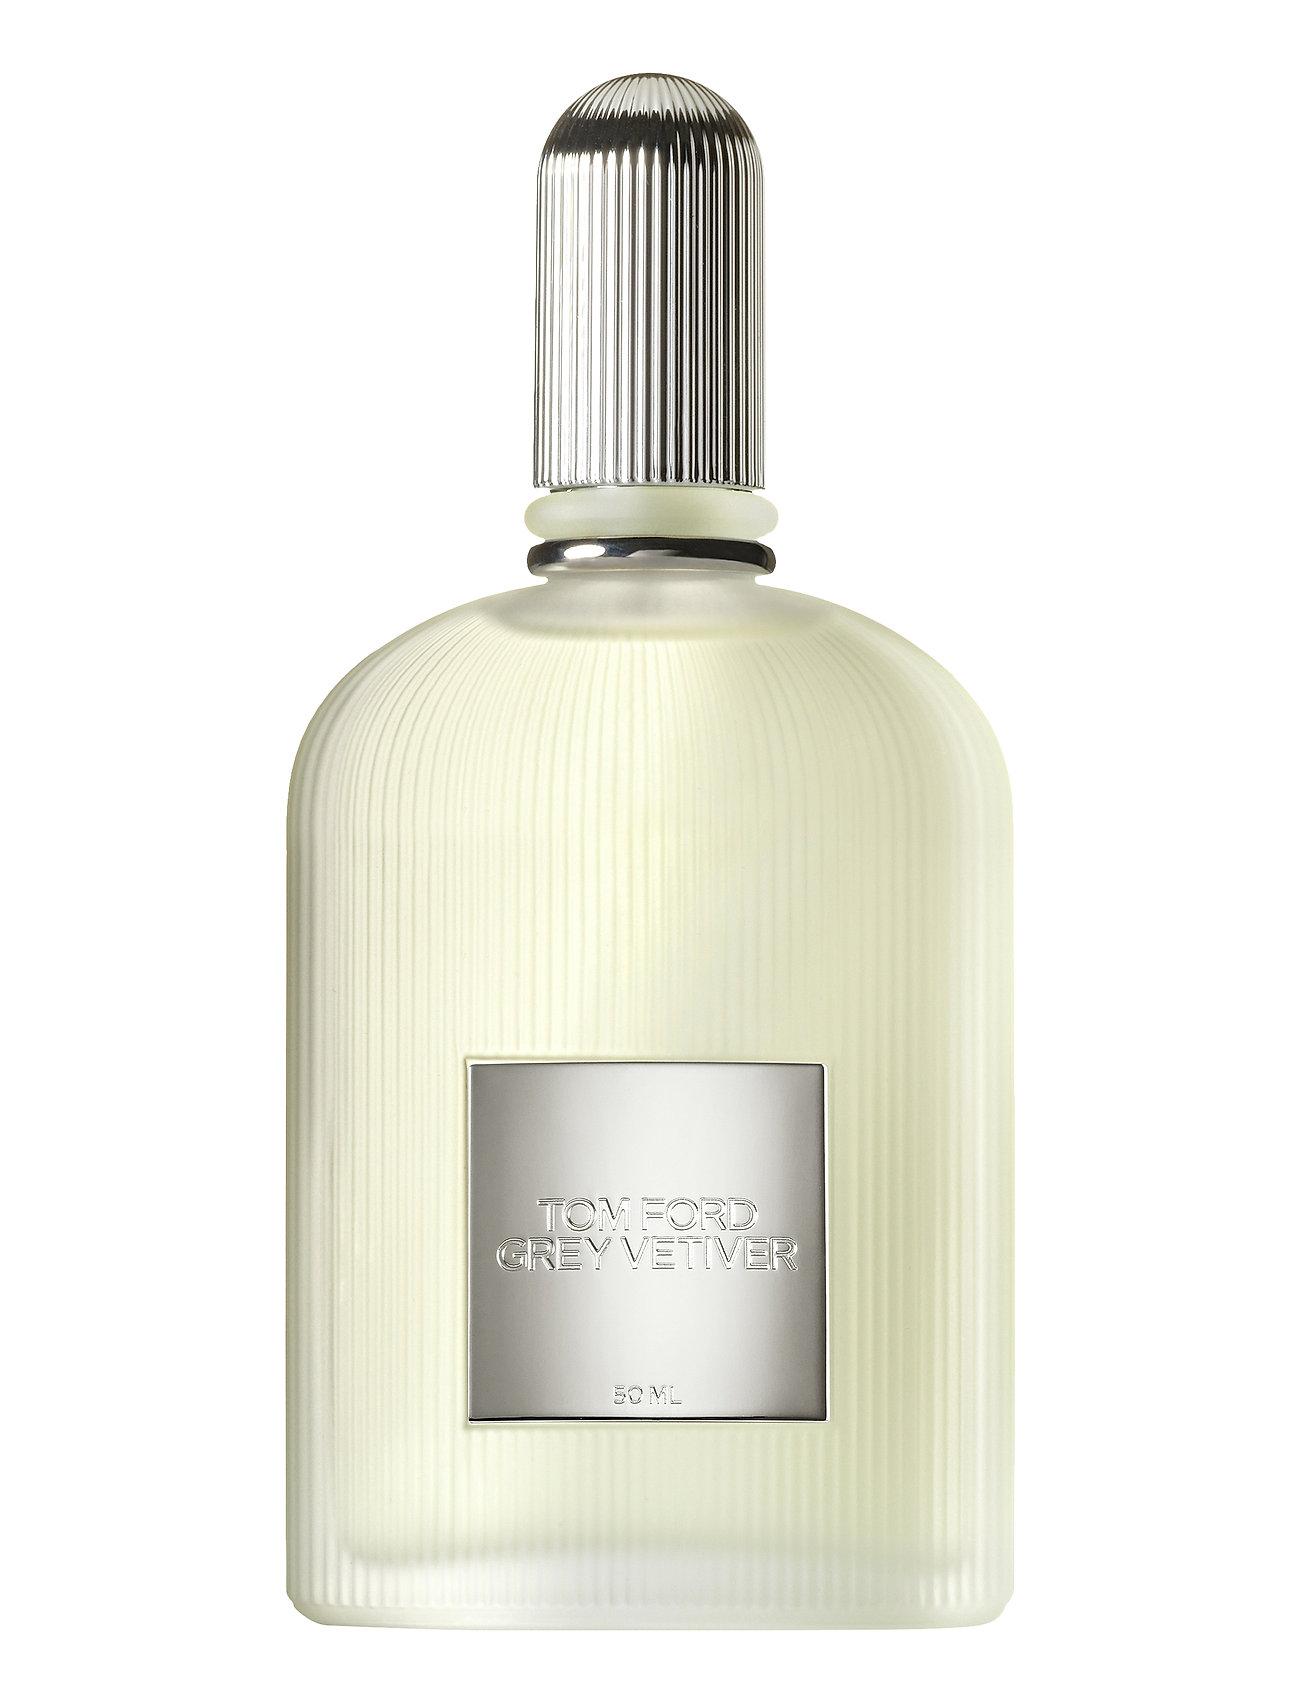 Tom ford grey vetiver eau de parfum fra tom ford på boozt.com dk